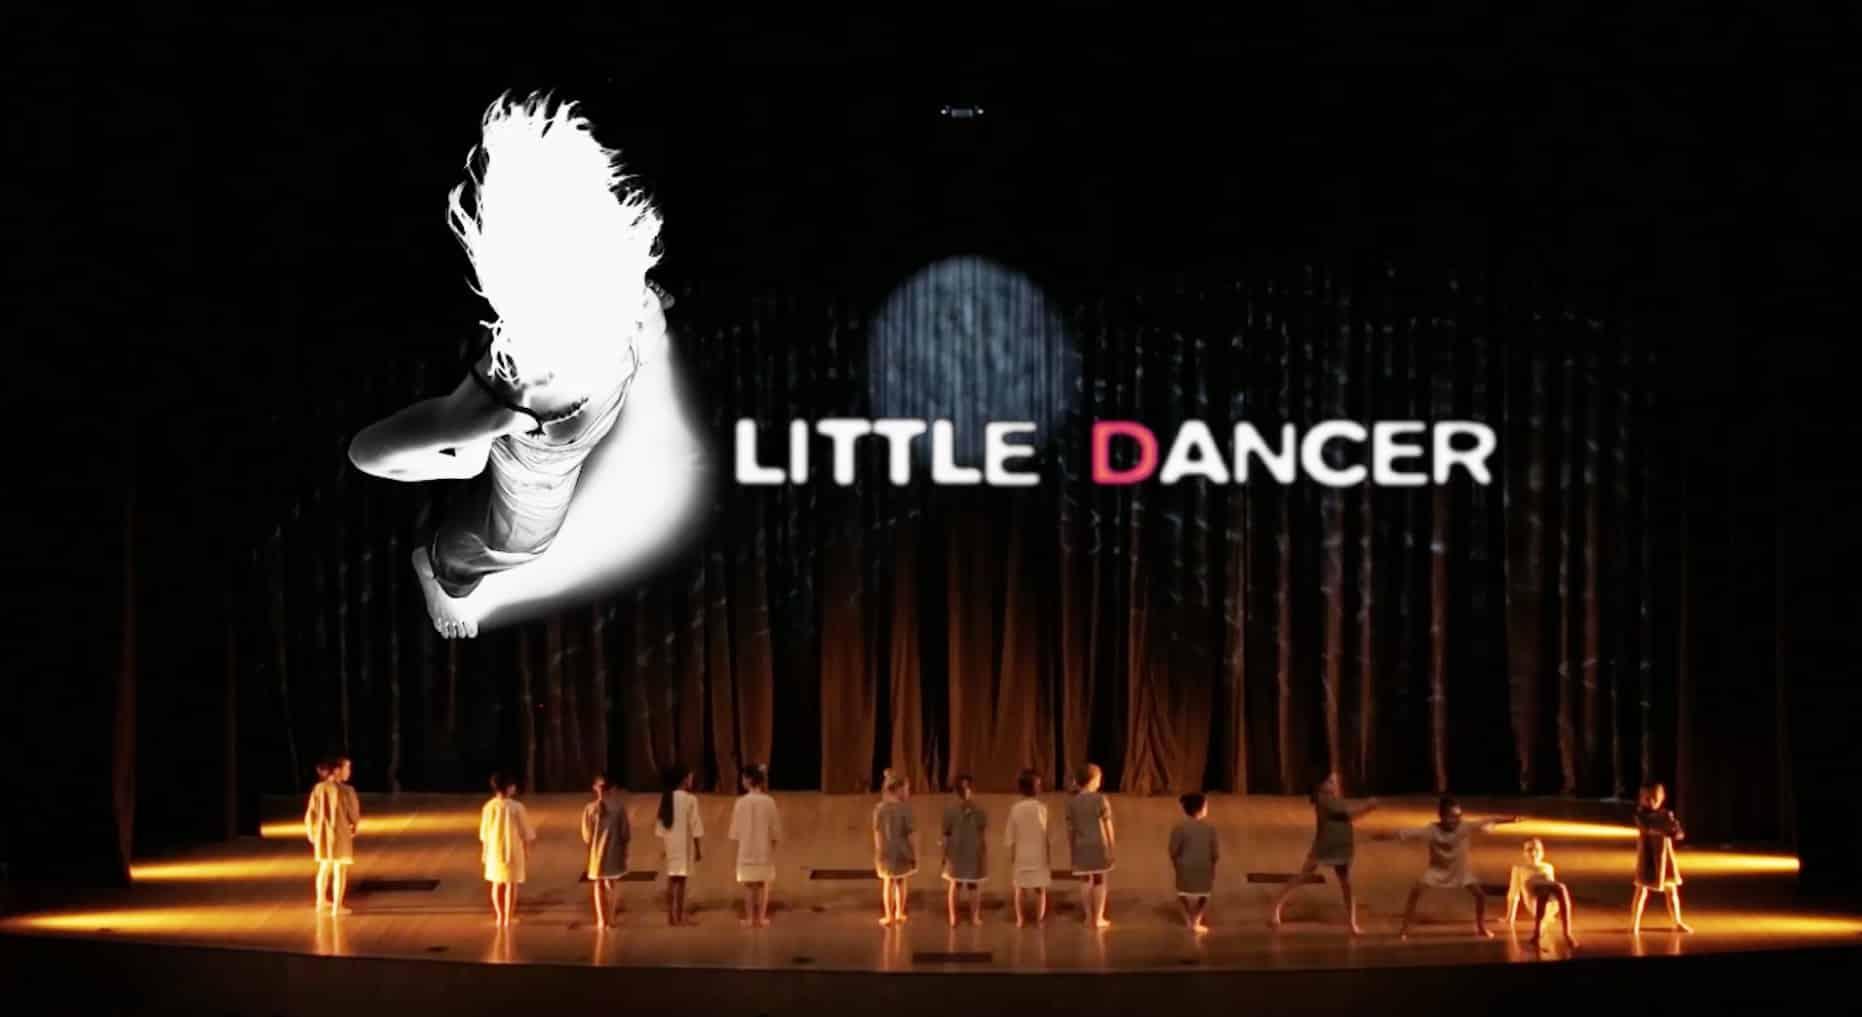 Bestof spectacle Littledancer 2016